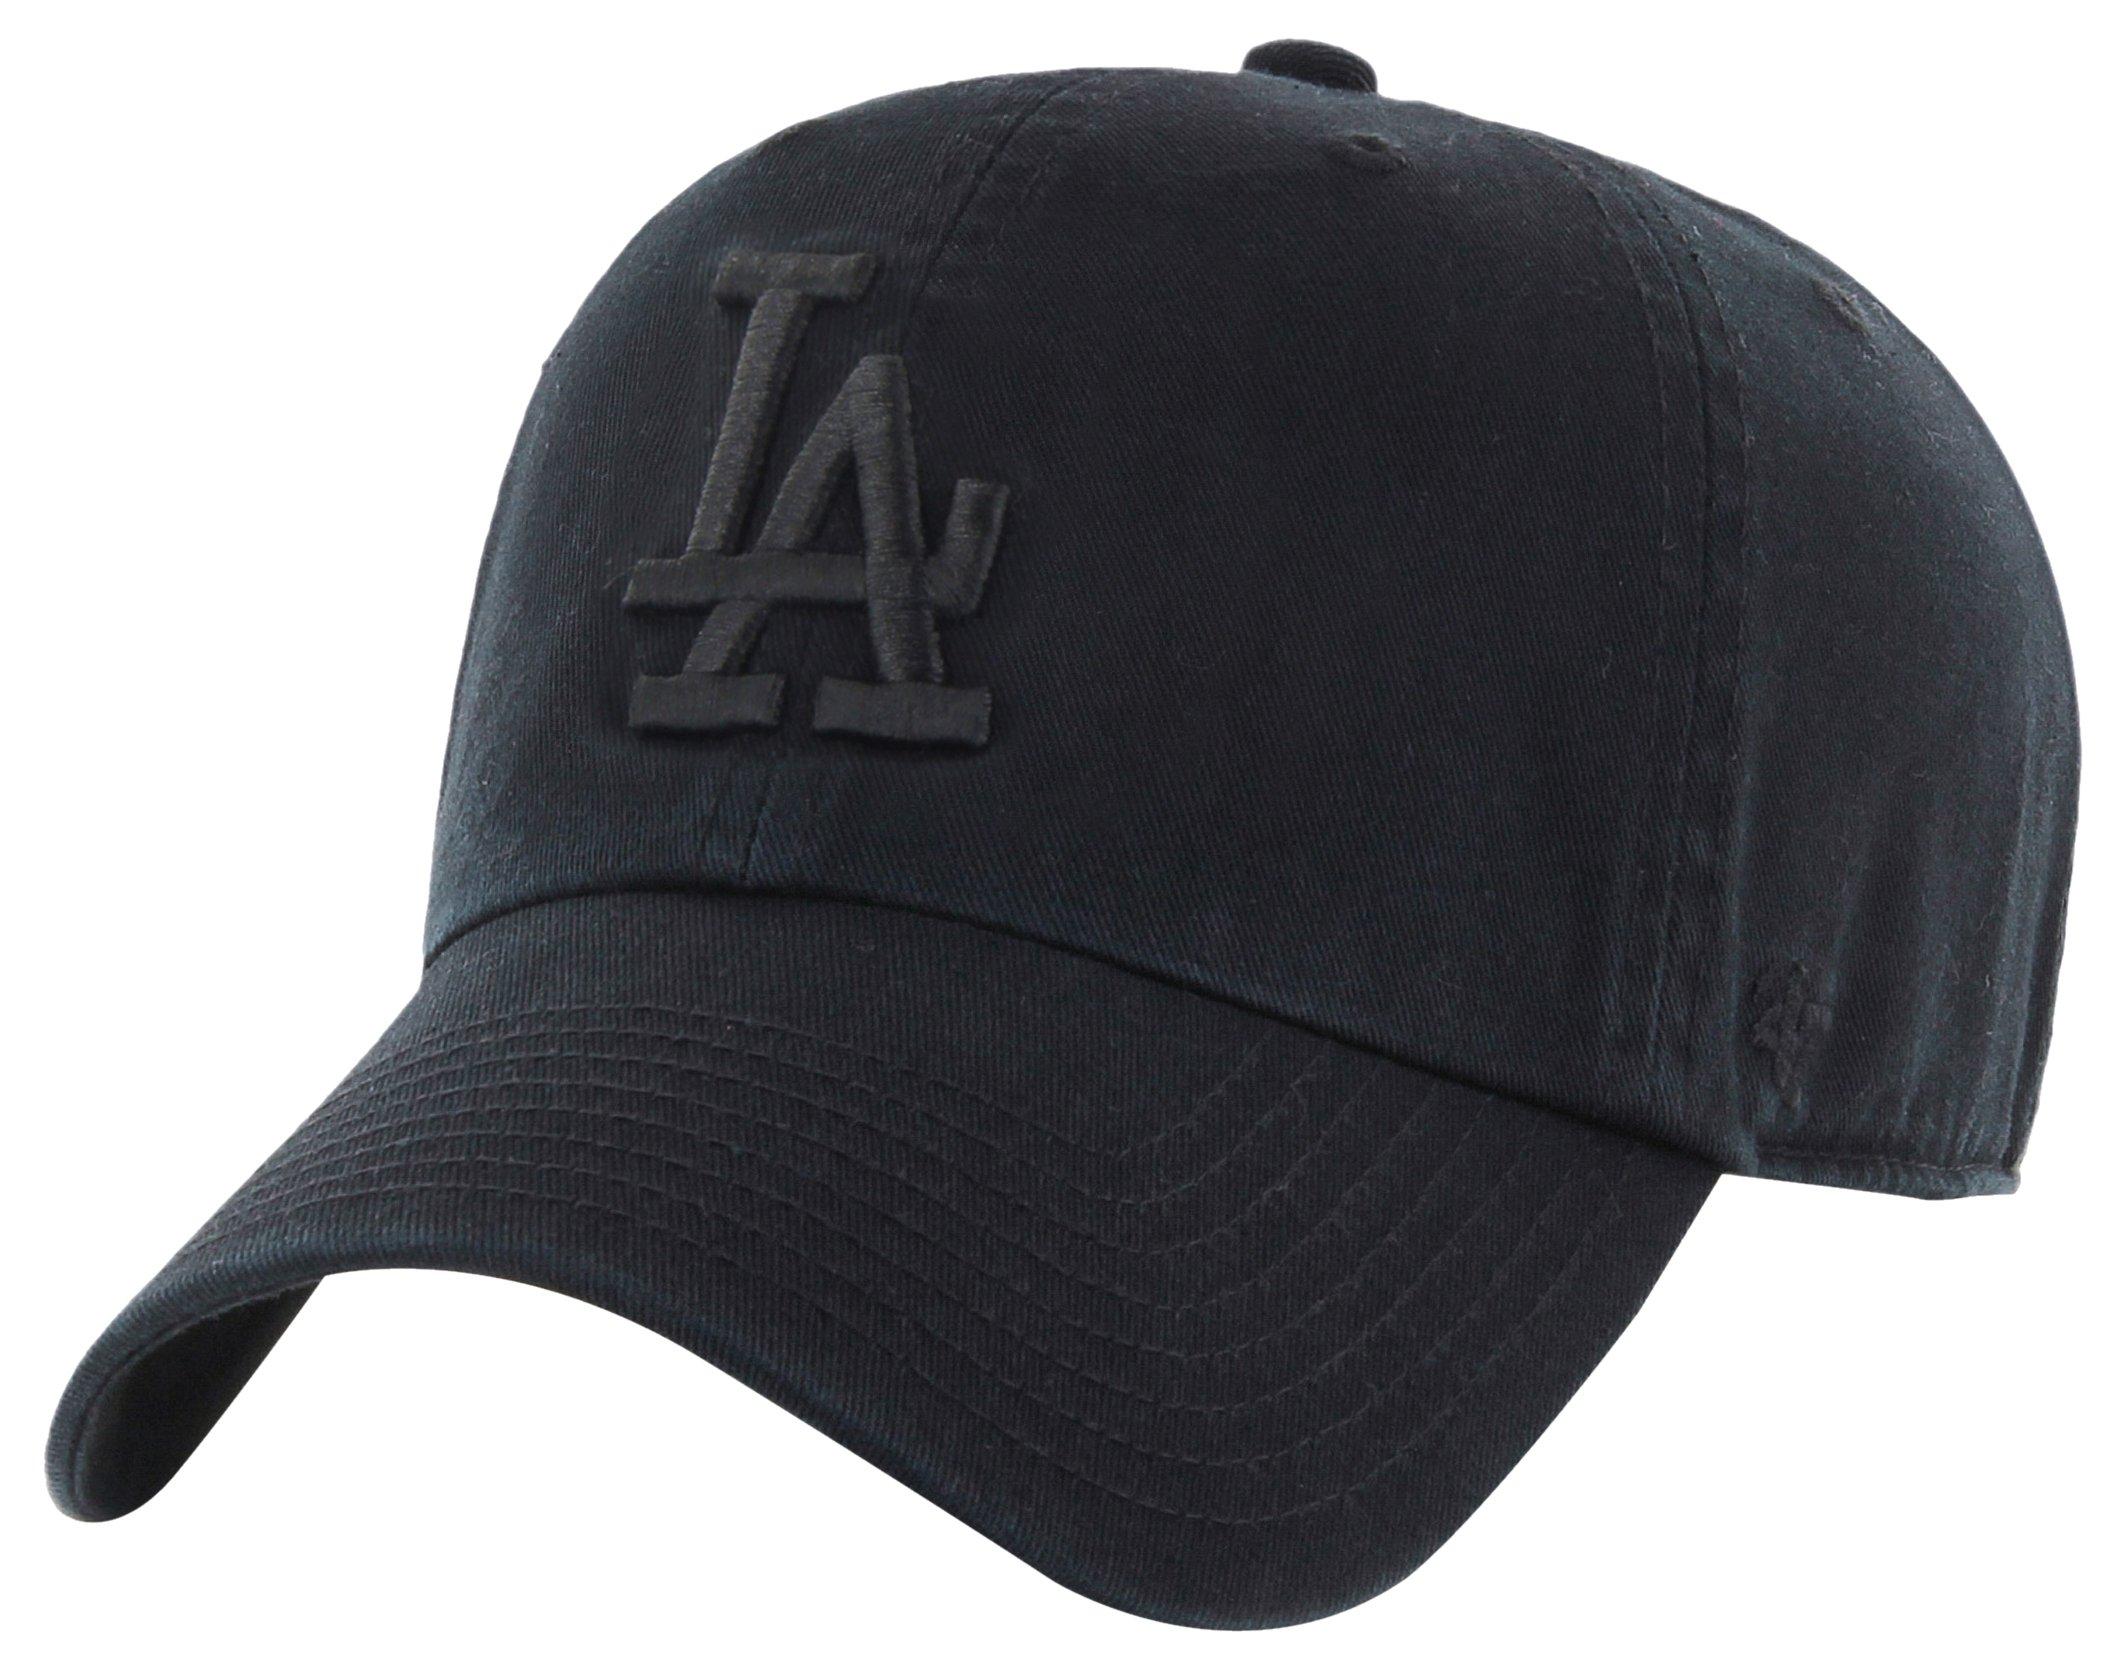 '47 Brand Los Angeles Dodgers Clean Up MLB Strapback Hat Cap All Black/Black